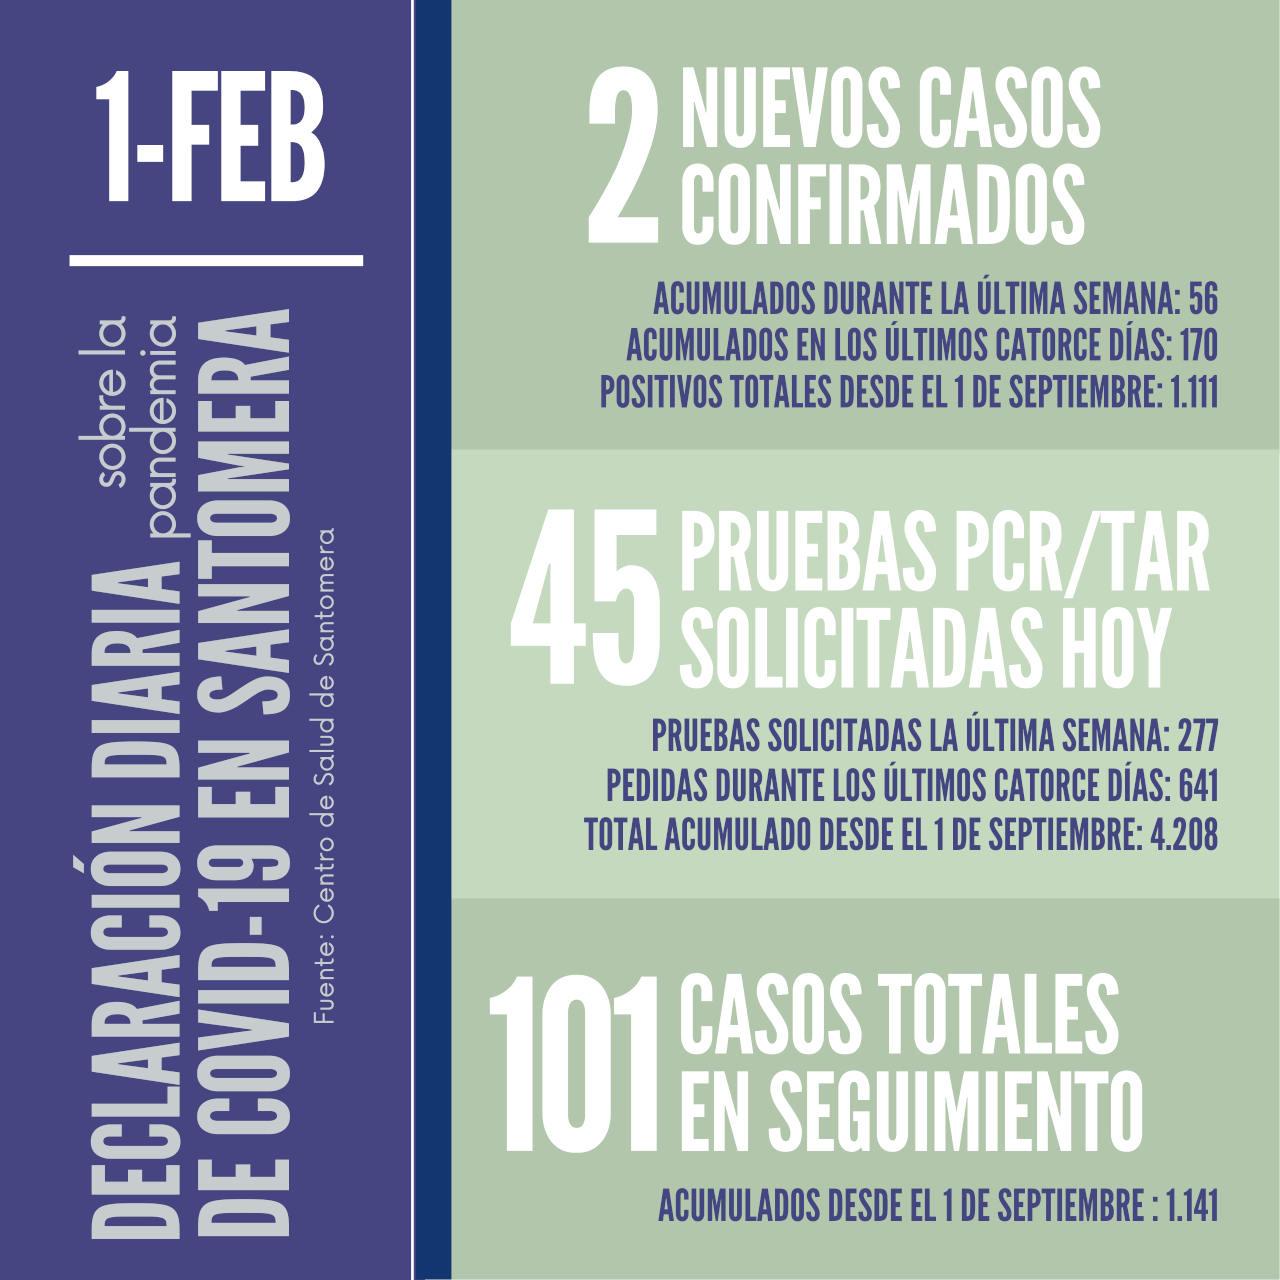 20210201_Datos COVID-19 Santomera